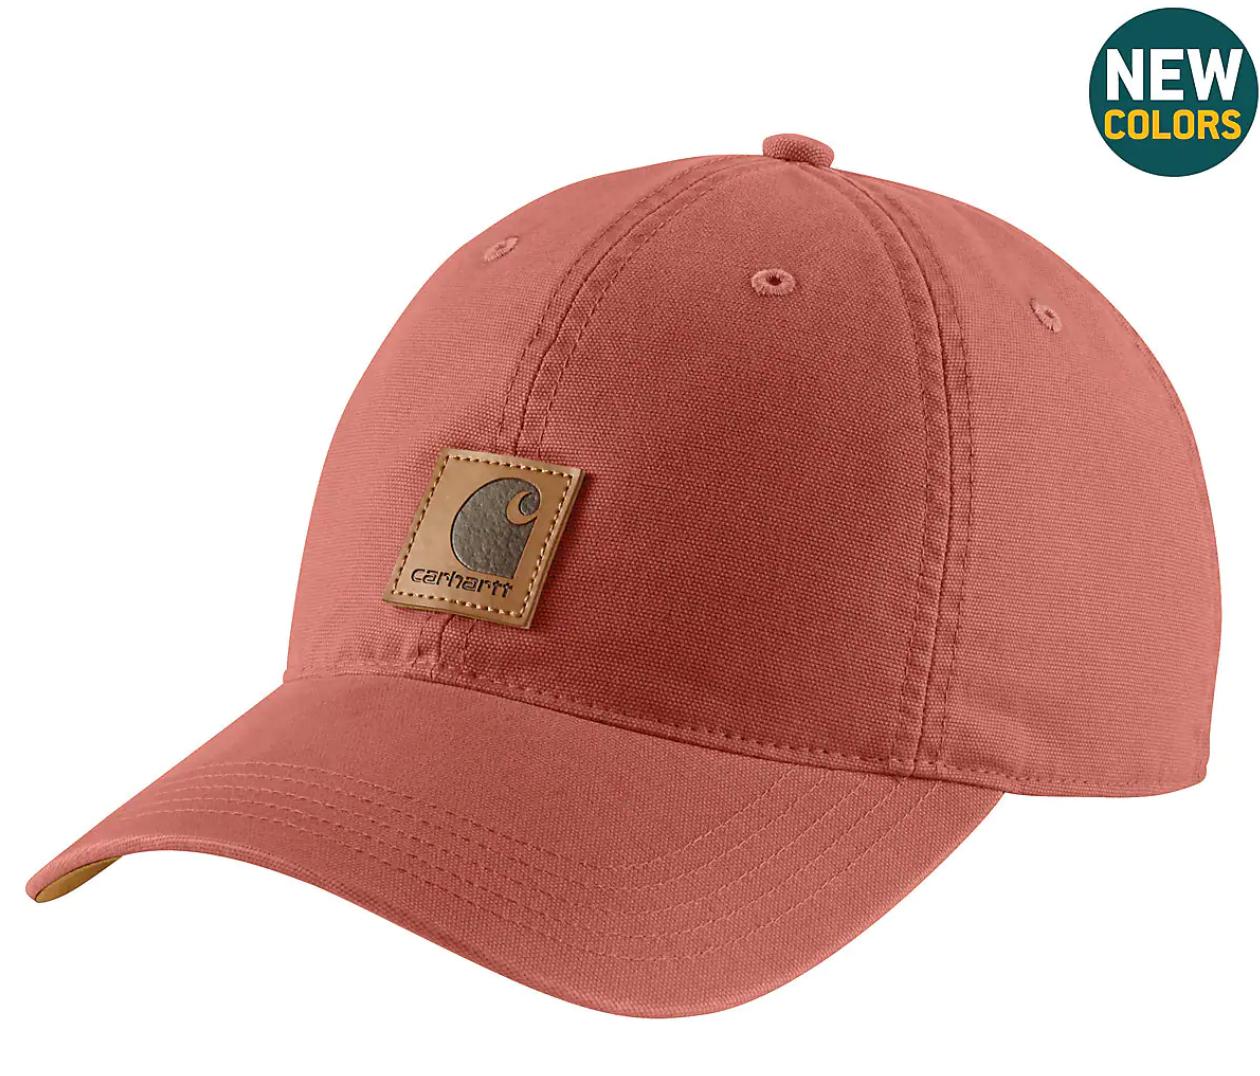 A faded reddish pink baseball hat